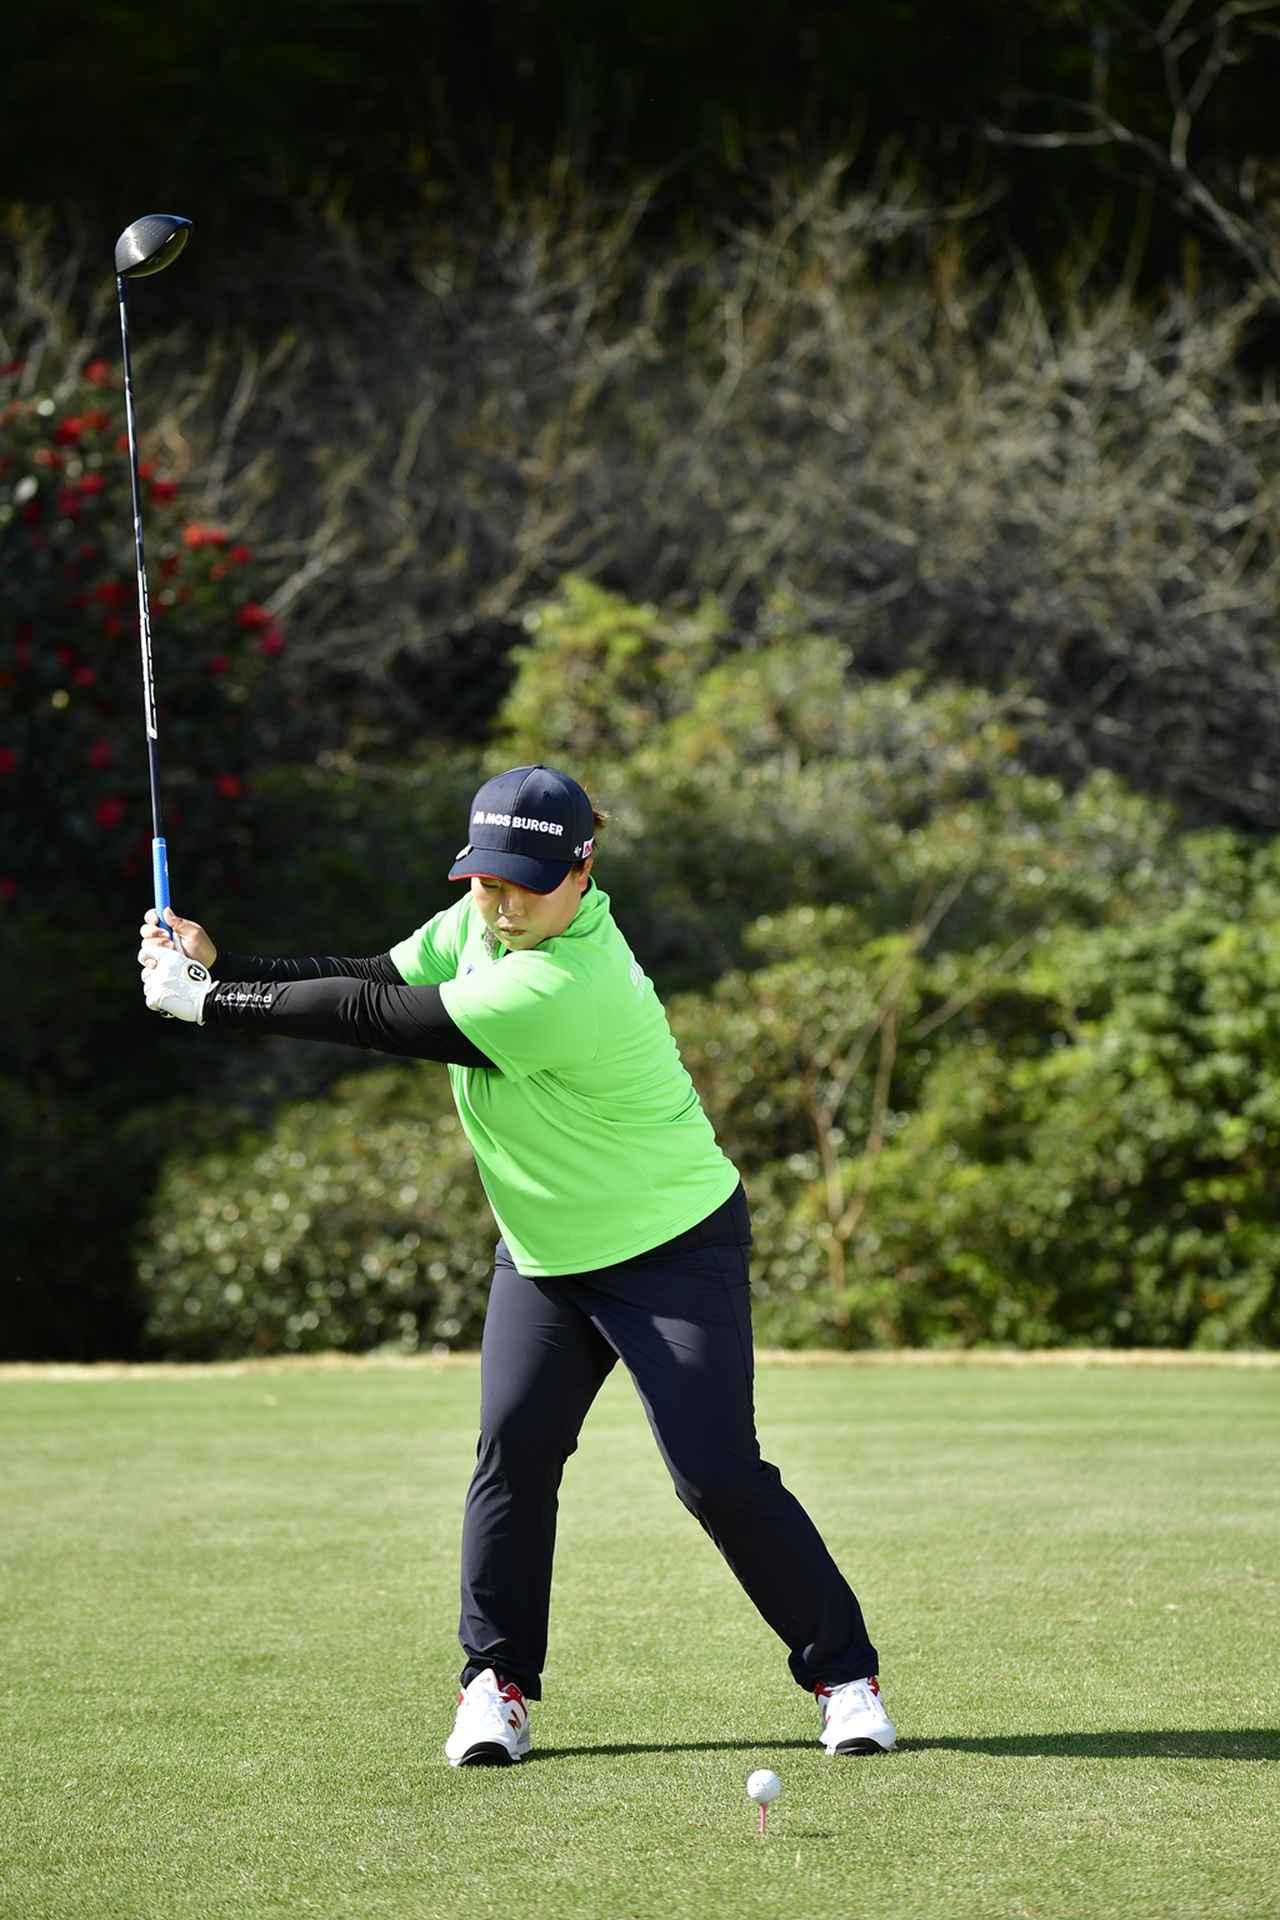 Images : 5番目の画像 - アン・ソンジュのドライバー連続写真 - みんなのゴルフダイジェスト